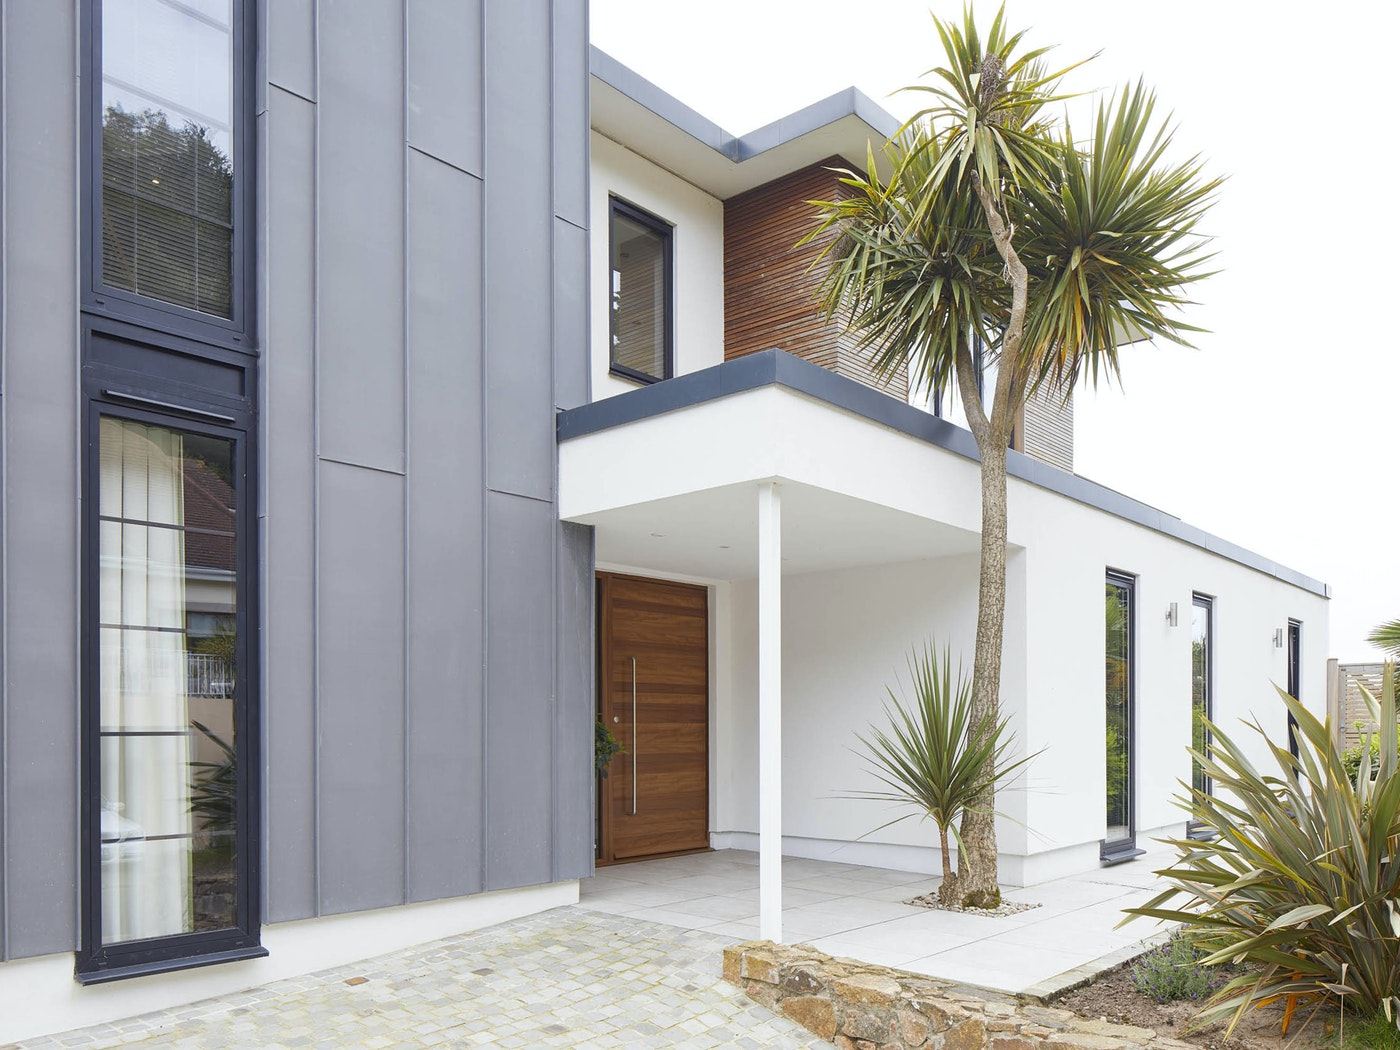 A modern front door canopy for a modern front door